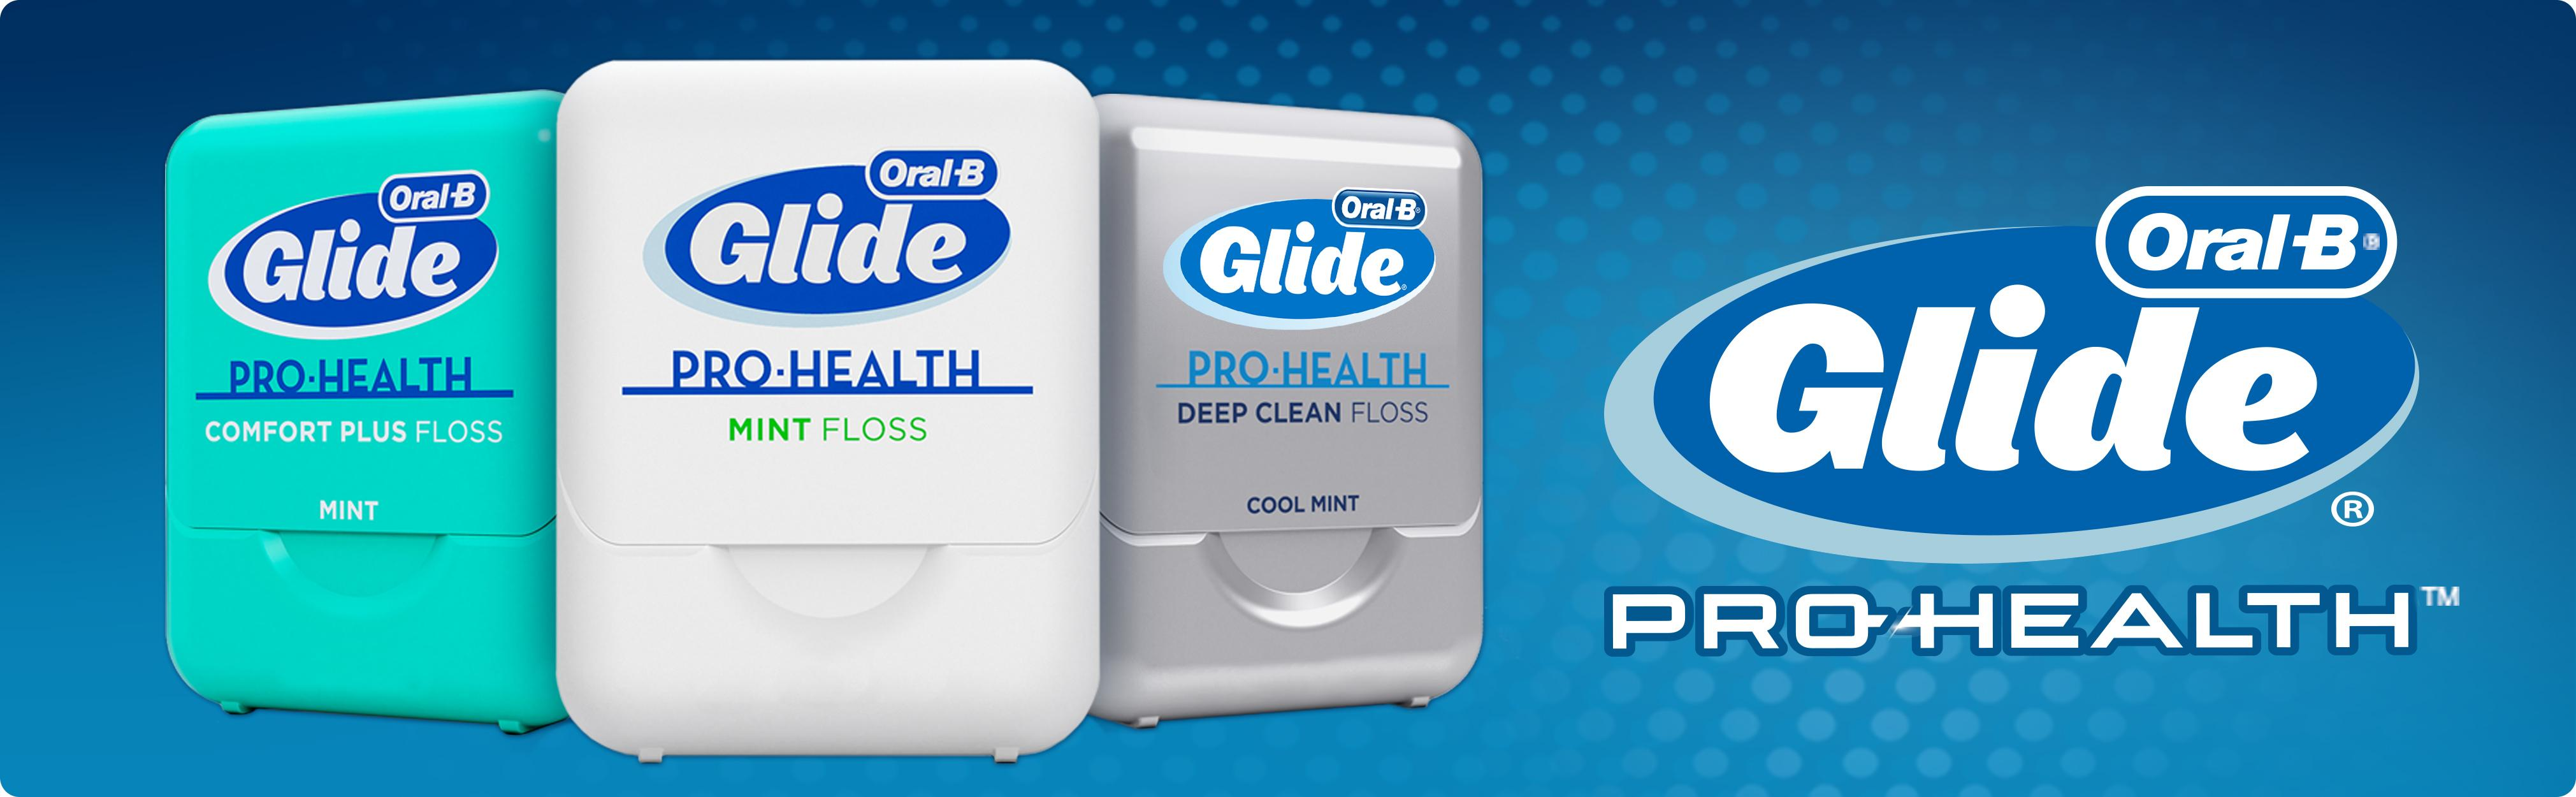 amazon com oral b glide pro health comfort plus dental floss mint